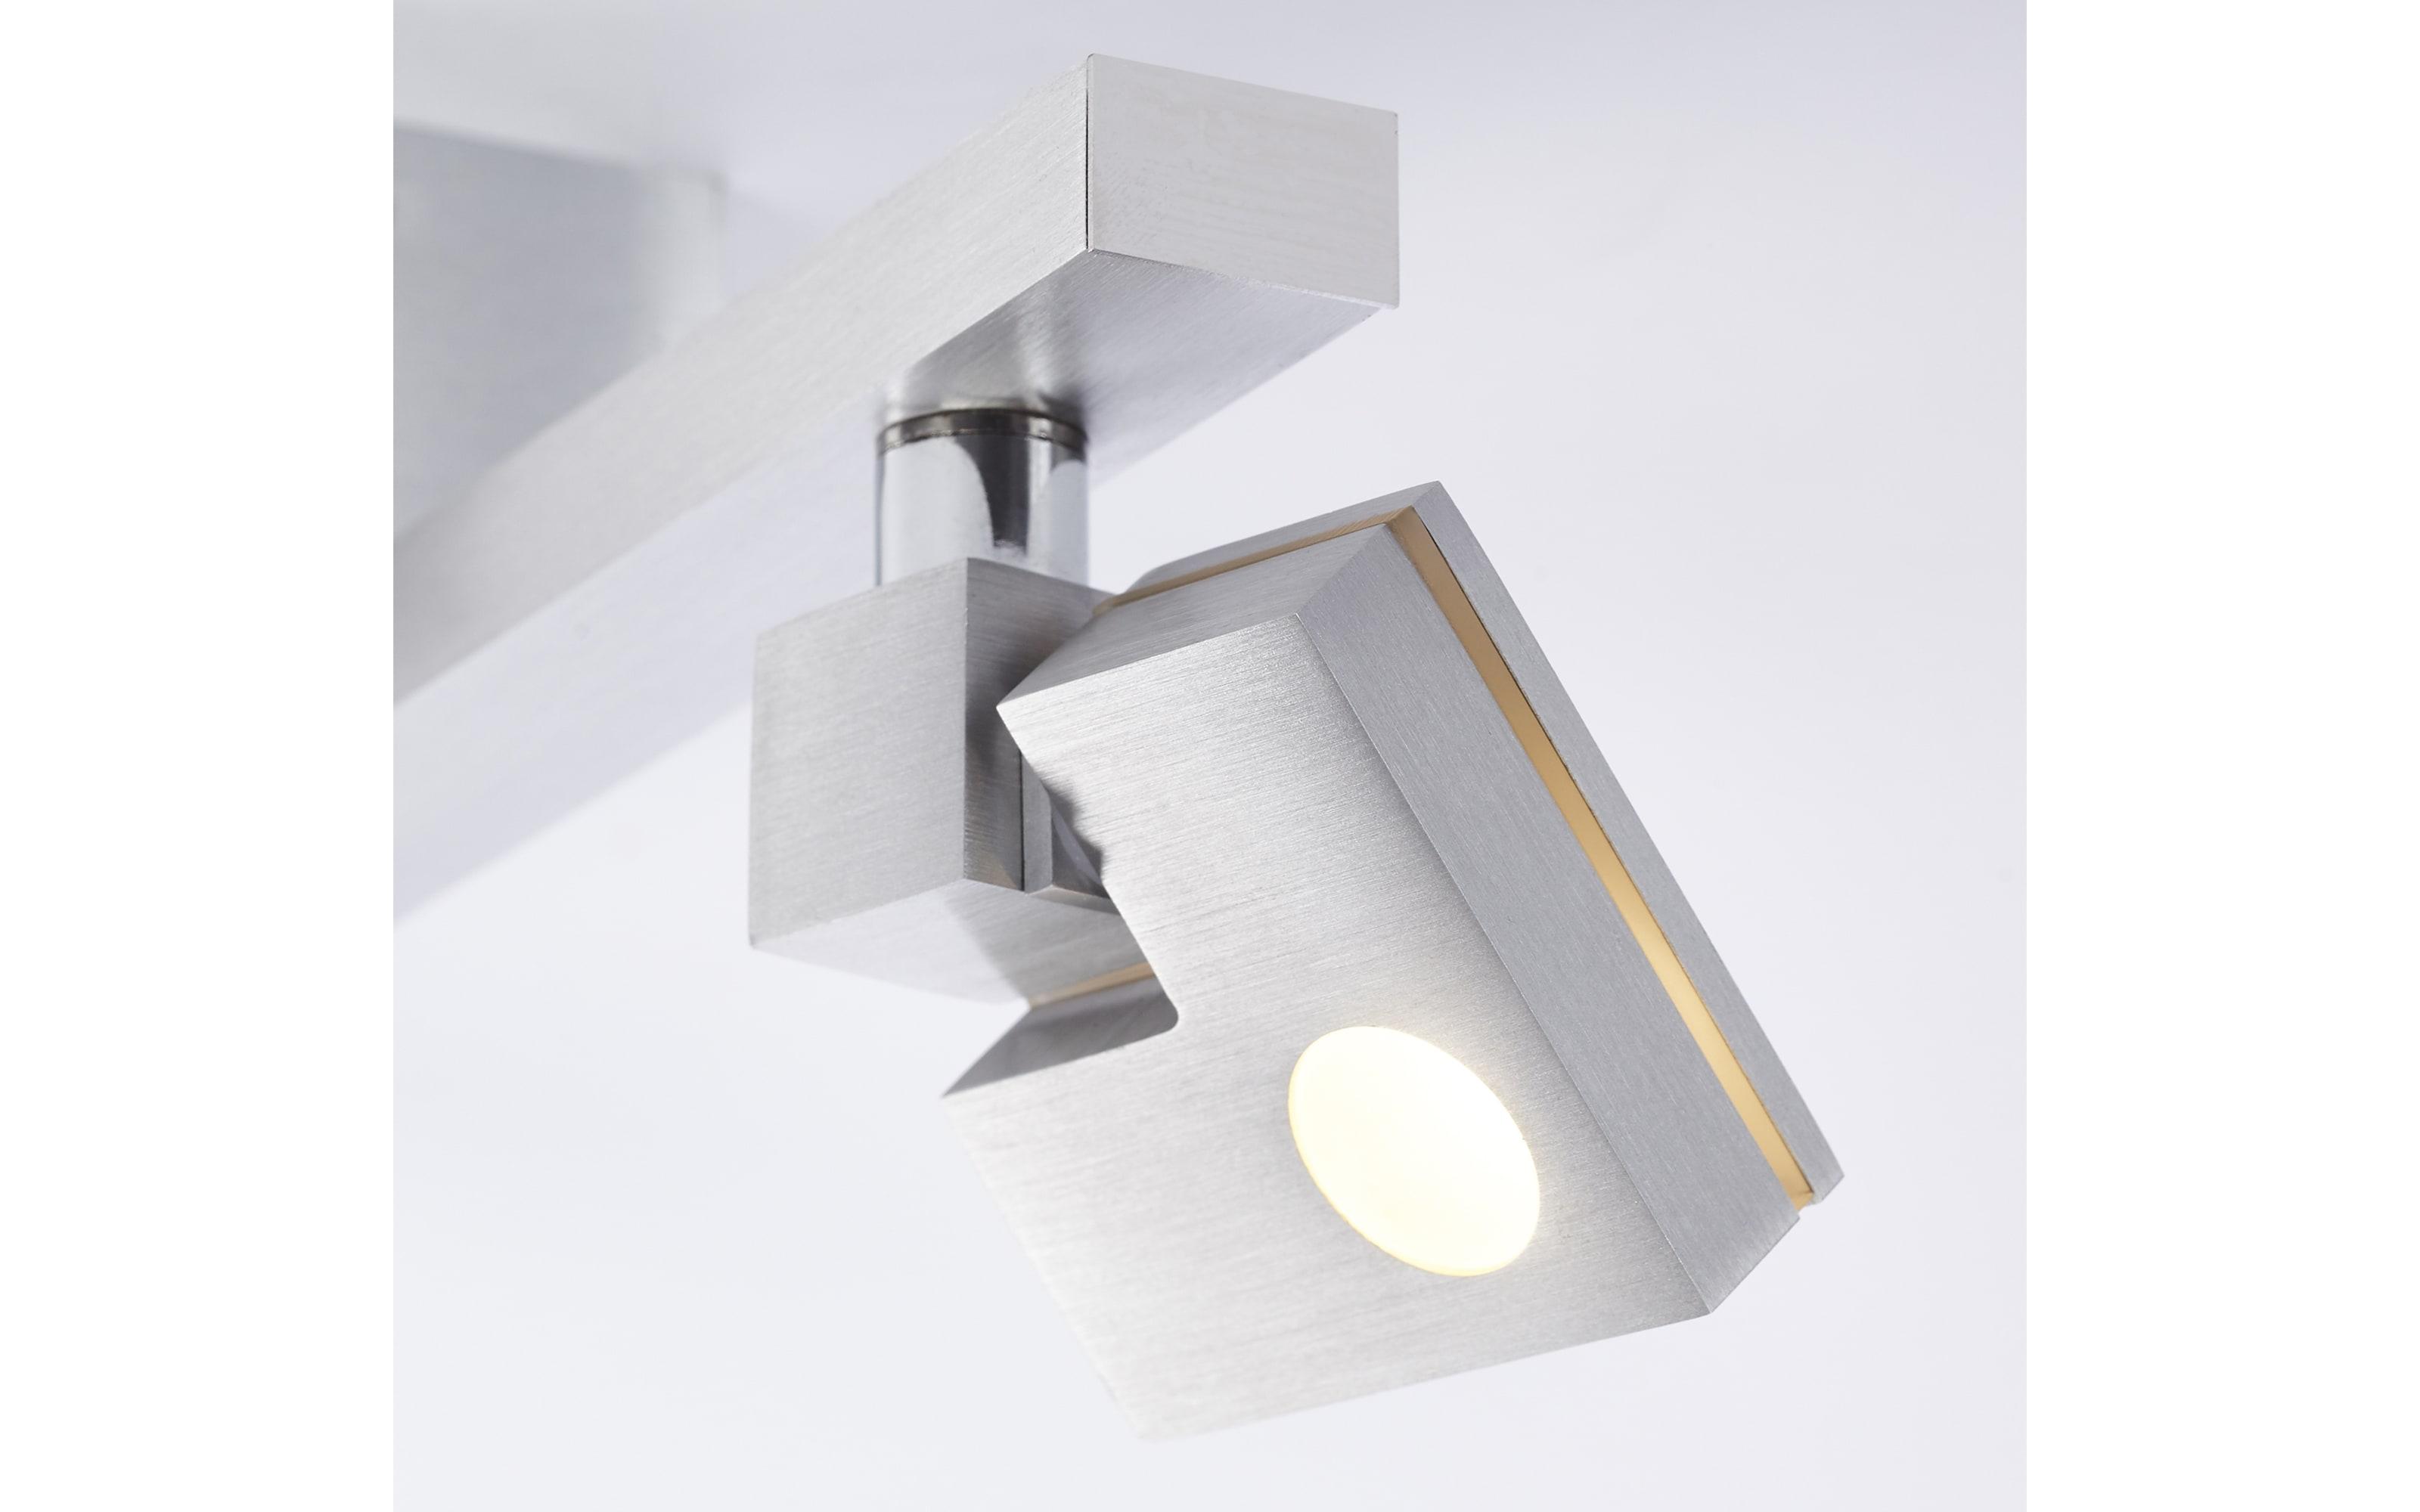 LED-Deckenleuchte Degree in silberfarbig, 2-flammig